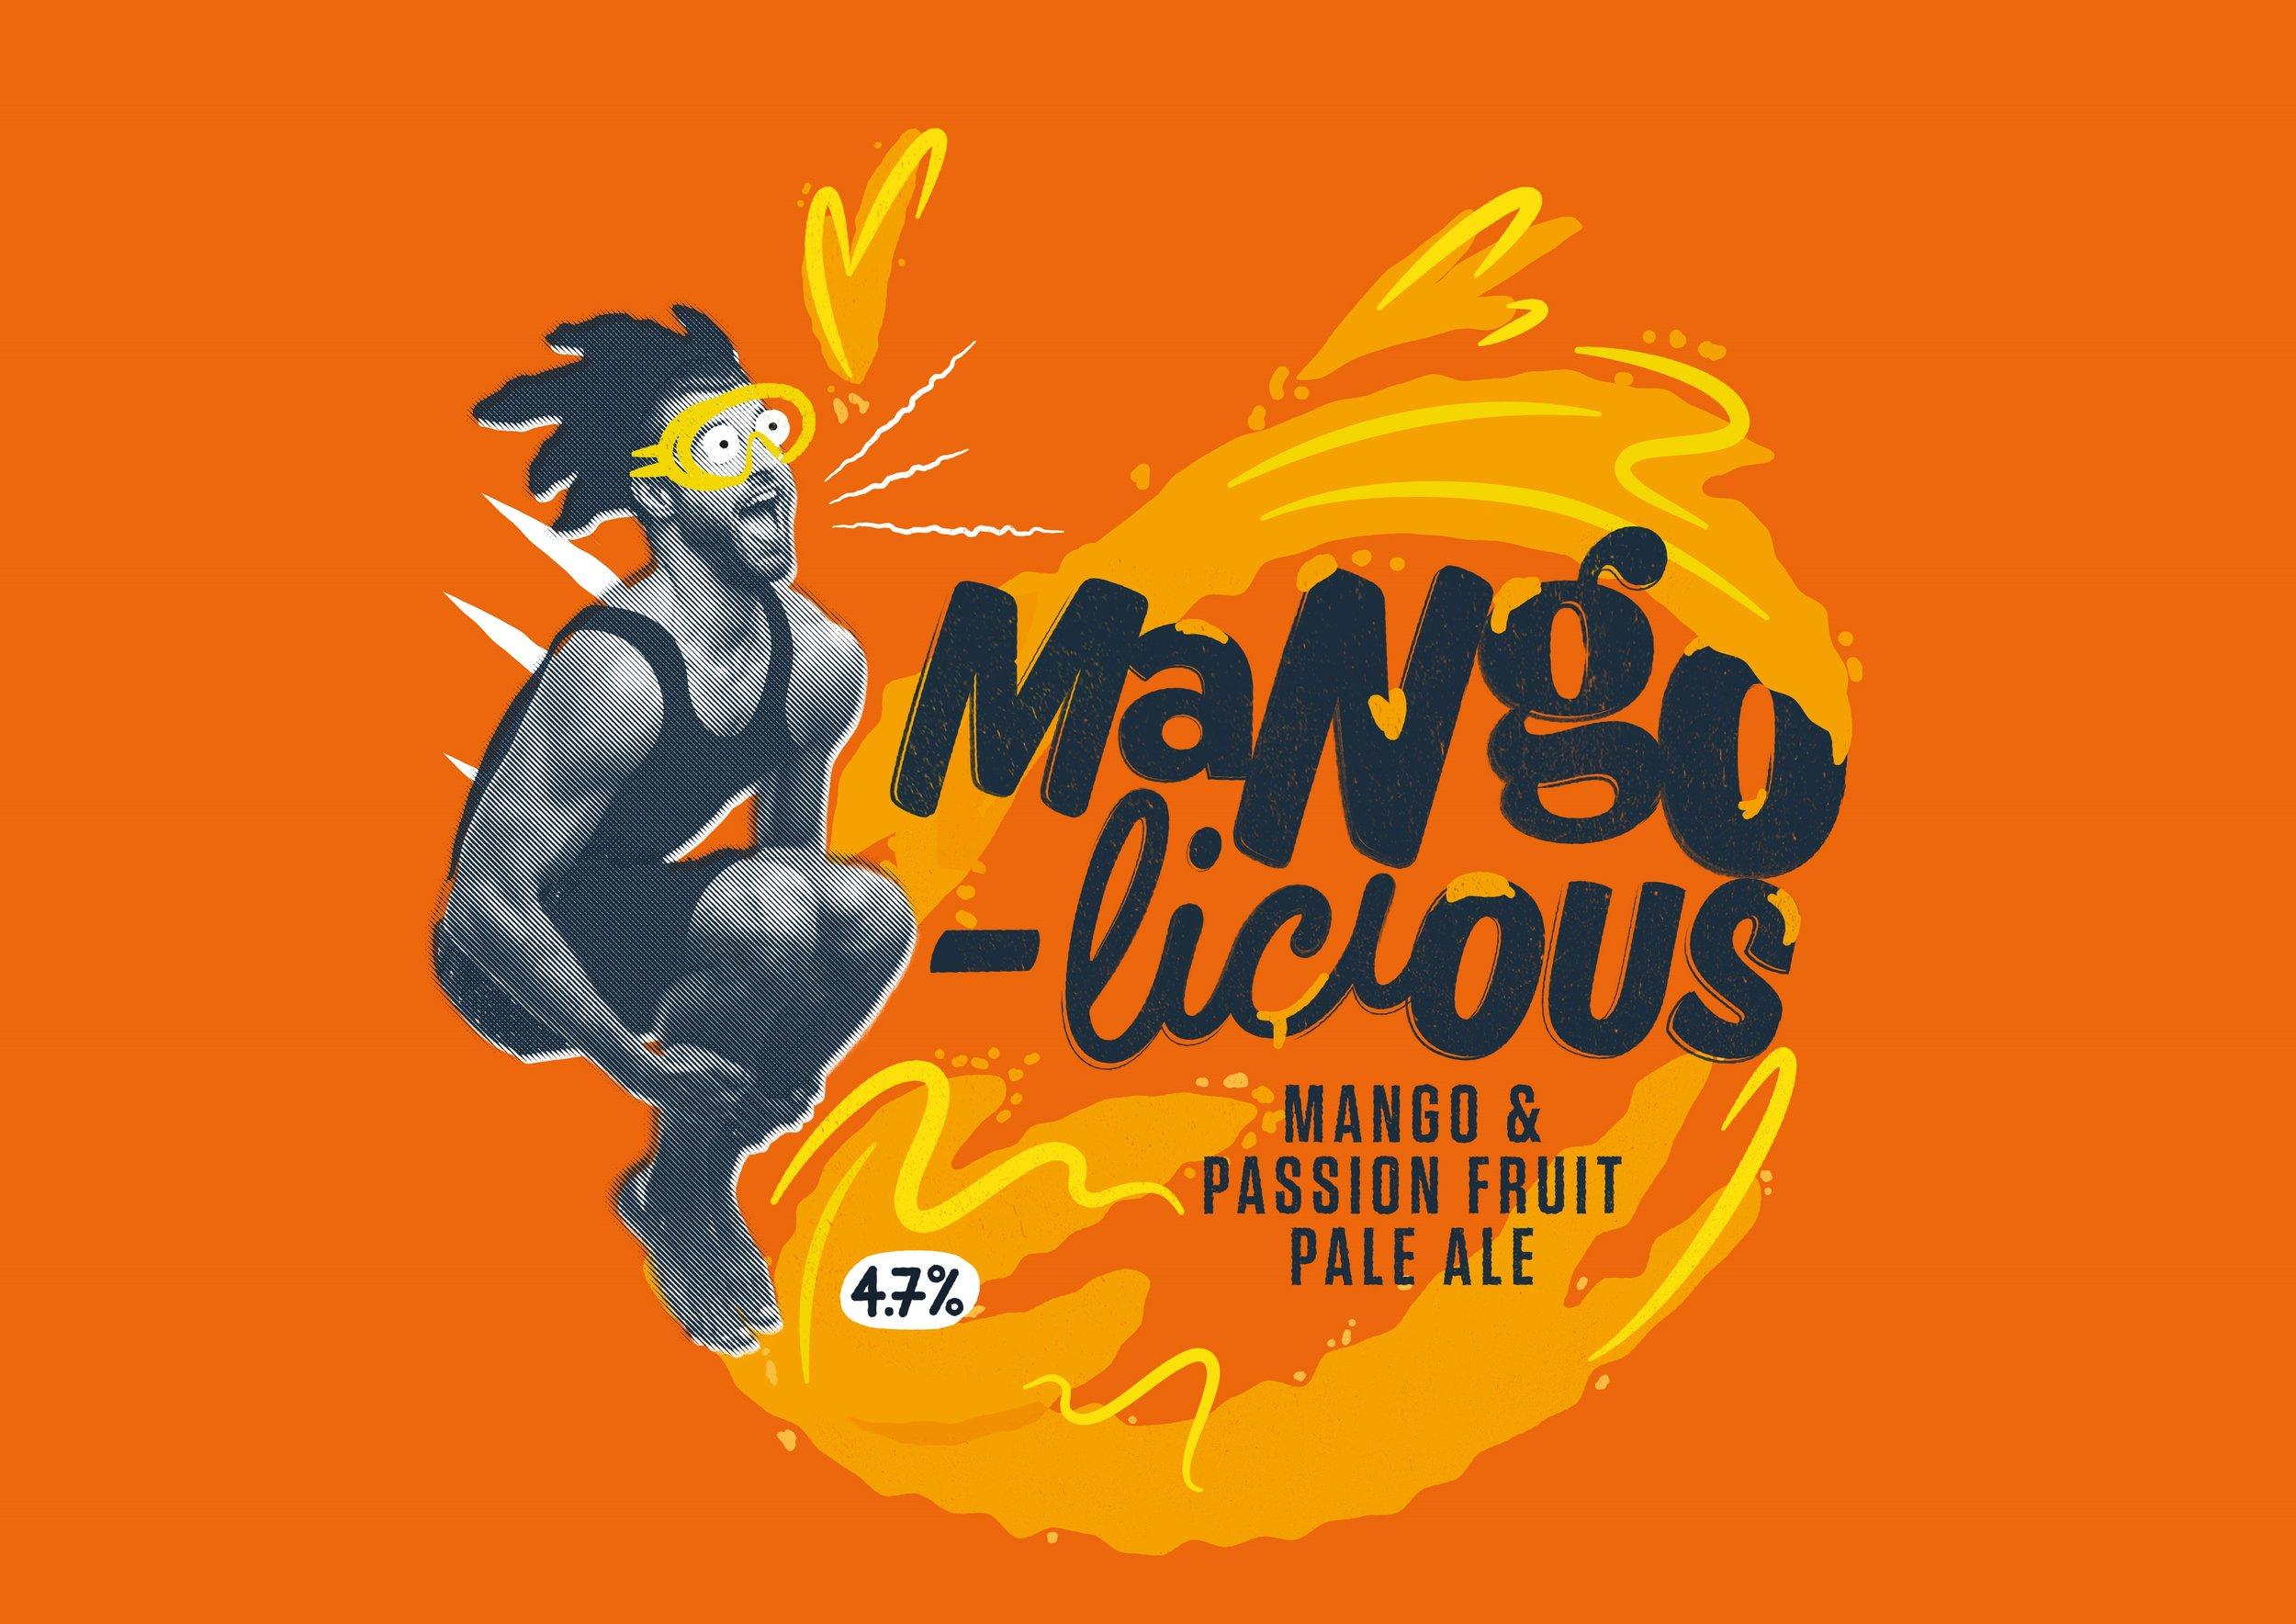 Mango square.jpg